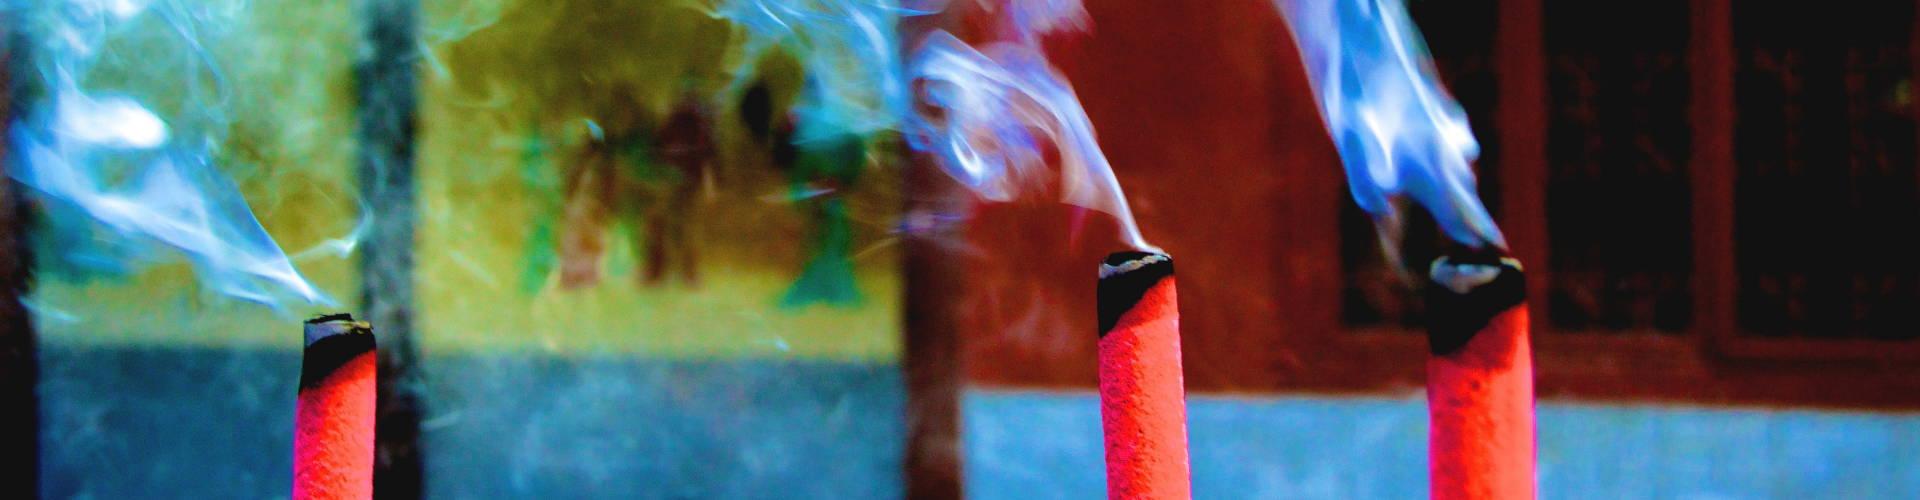 incense burnng